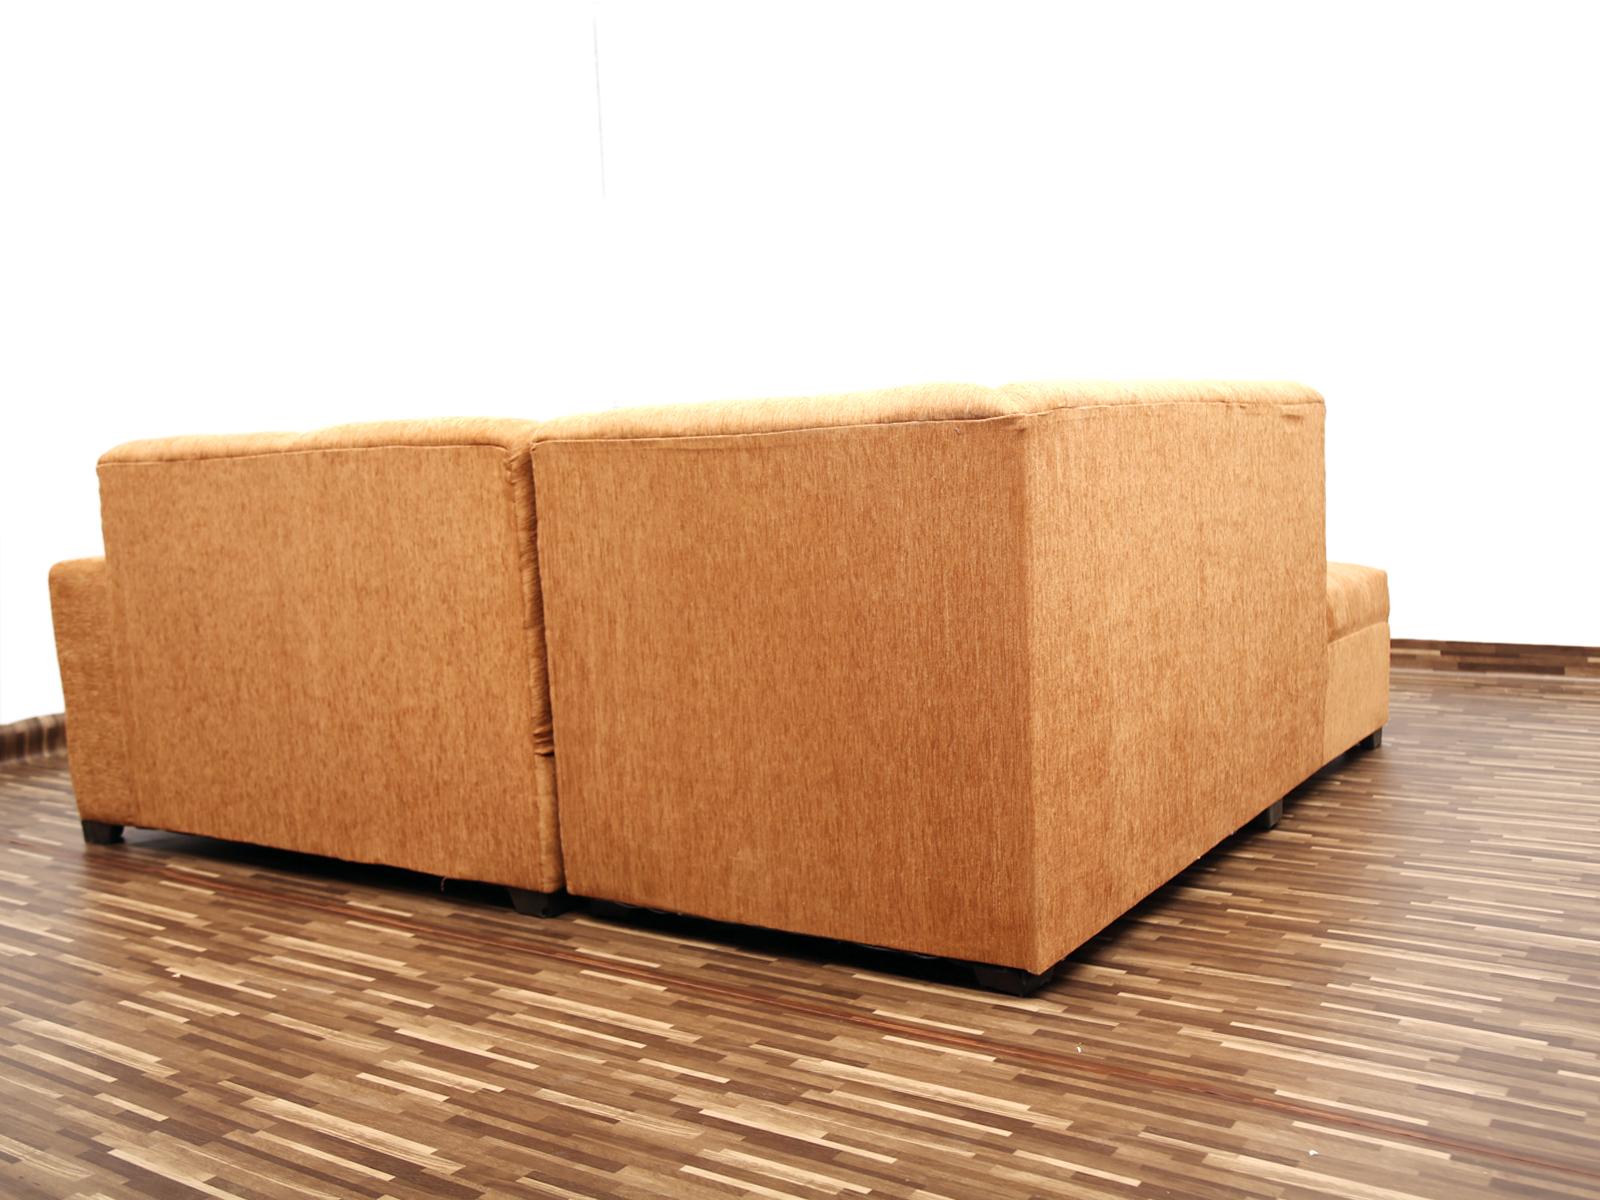 beige l shape sofa with settee used furniture for sale. Black Bedroom Furniture Sets. Home Design Ideas